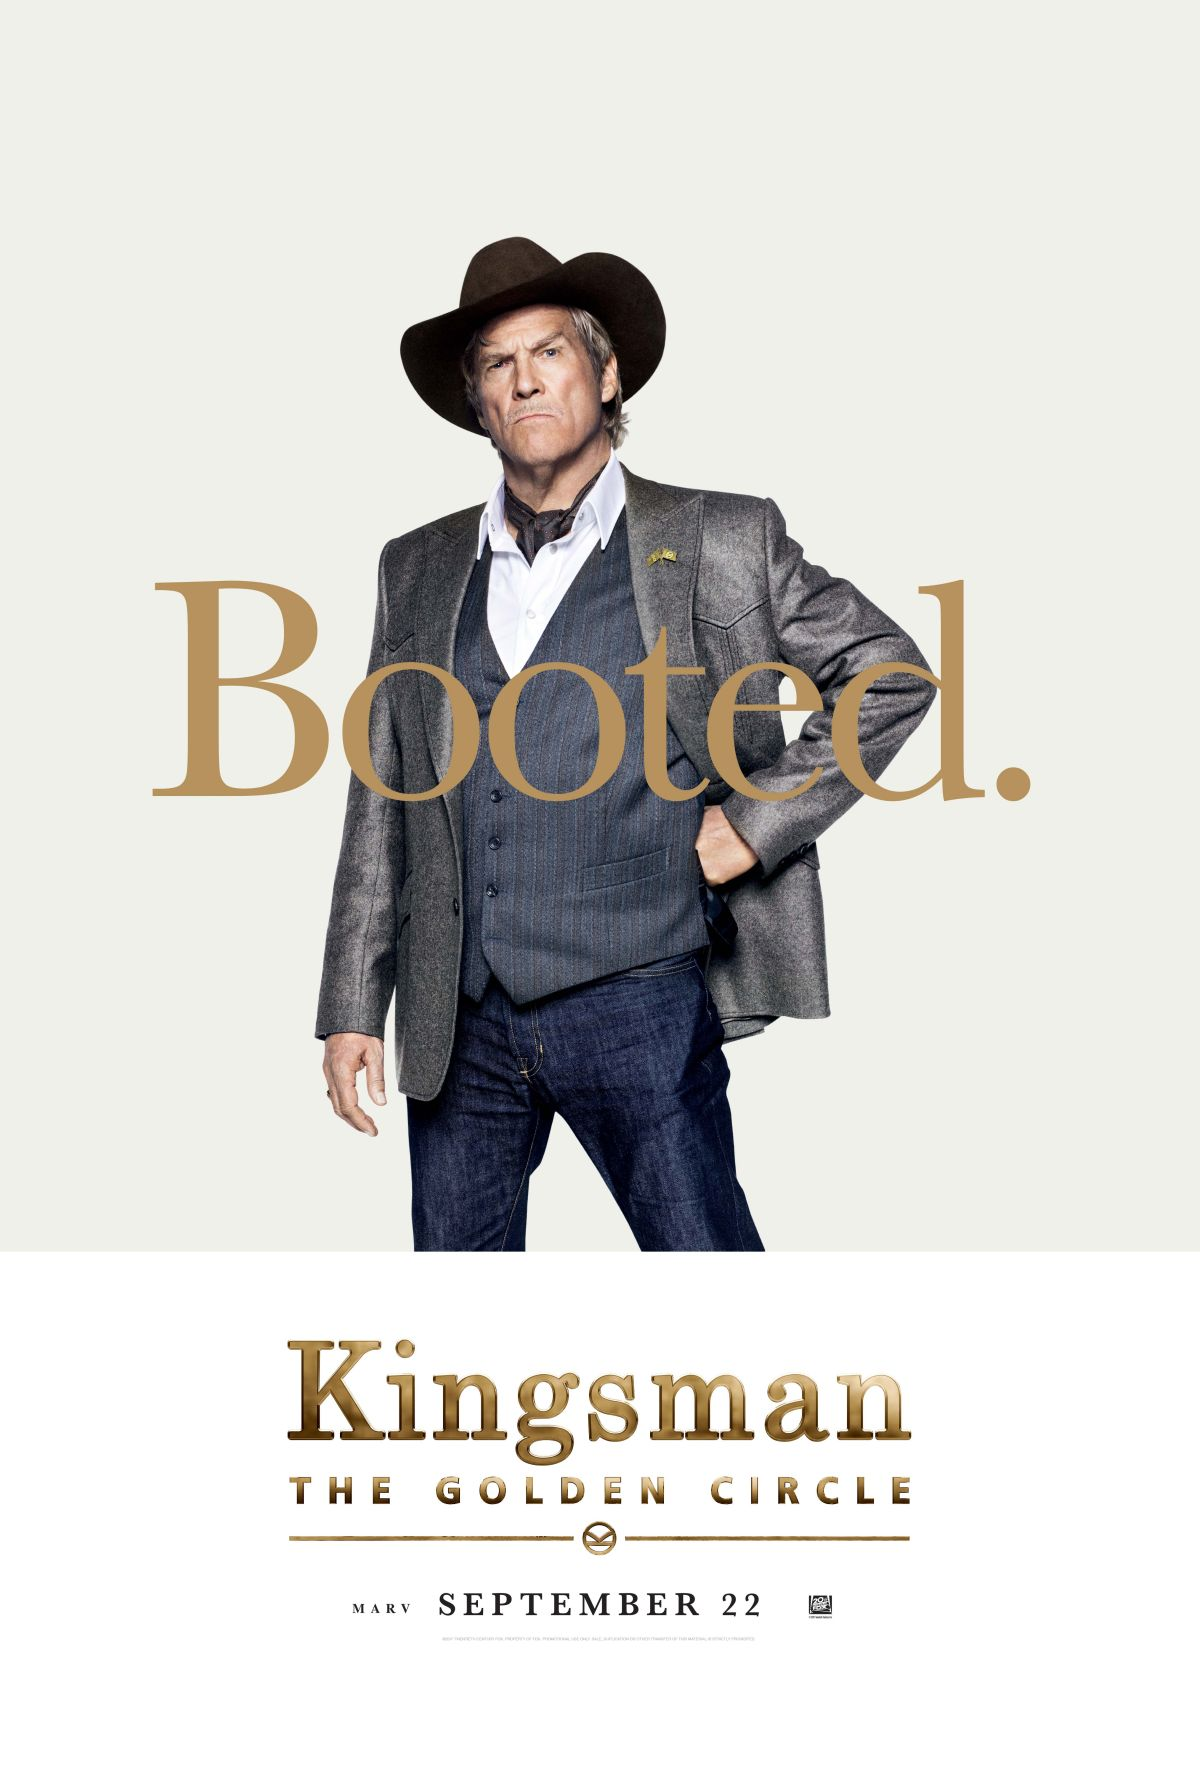 Kingsman: Il cerchio d'oro - Il character poster di Jeff Bridges